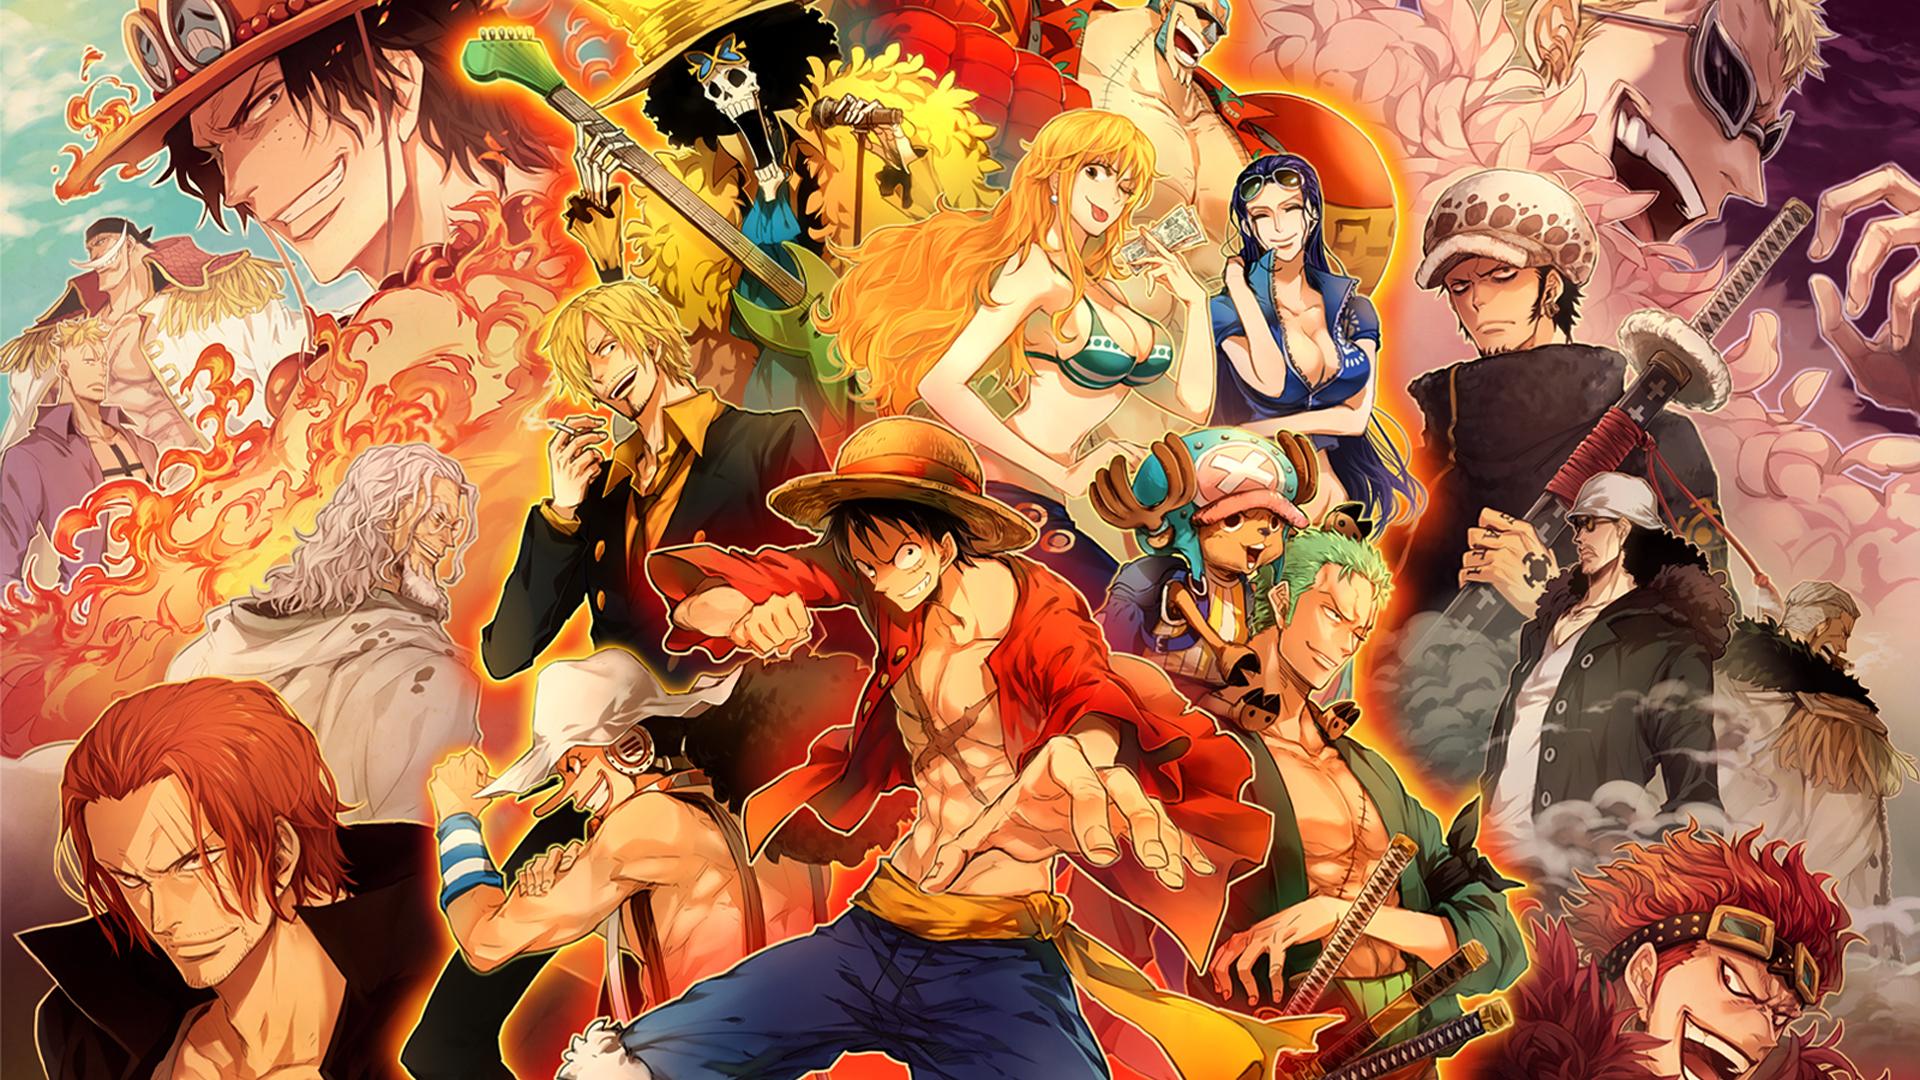 49 Anime Wallpapers Reddit On Wallpapersafari